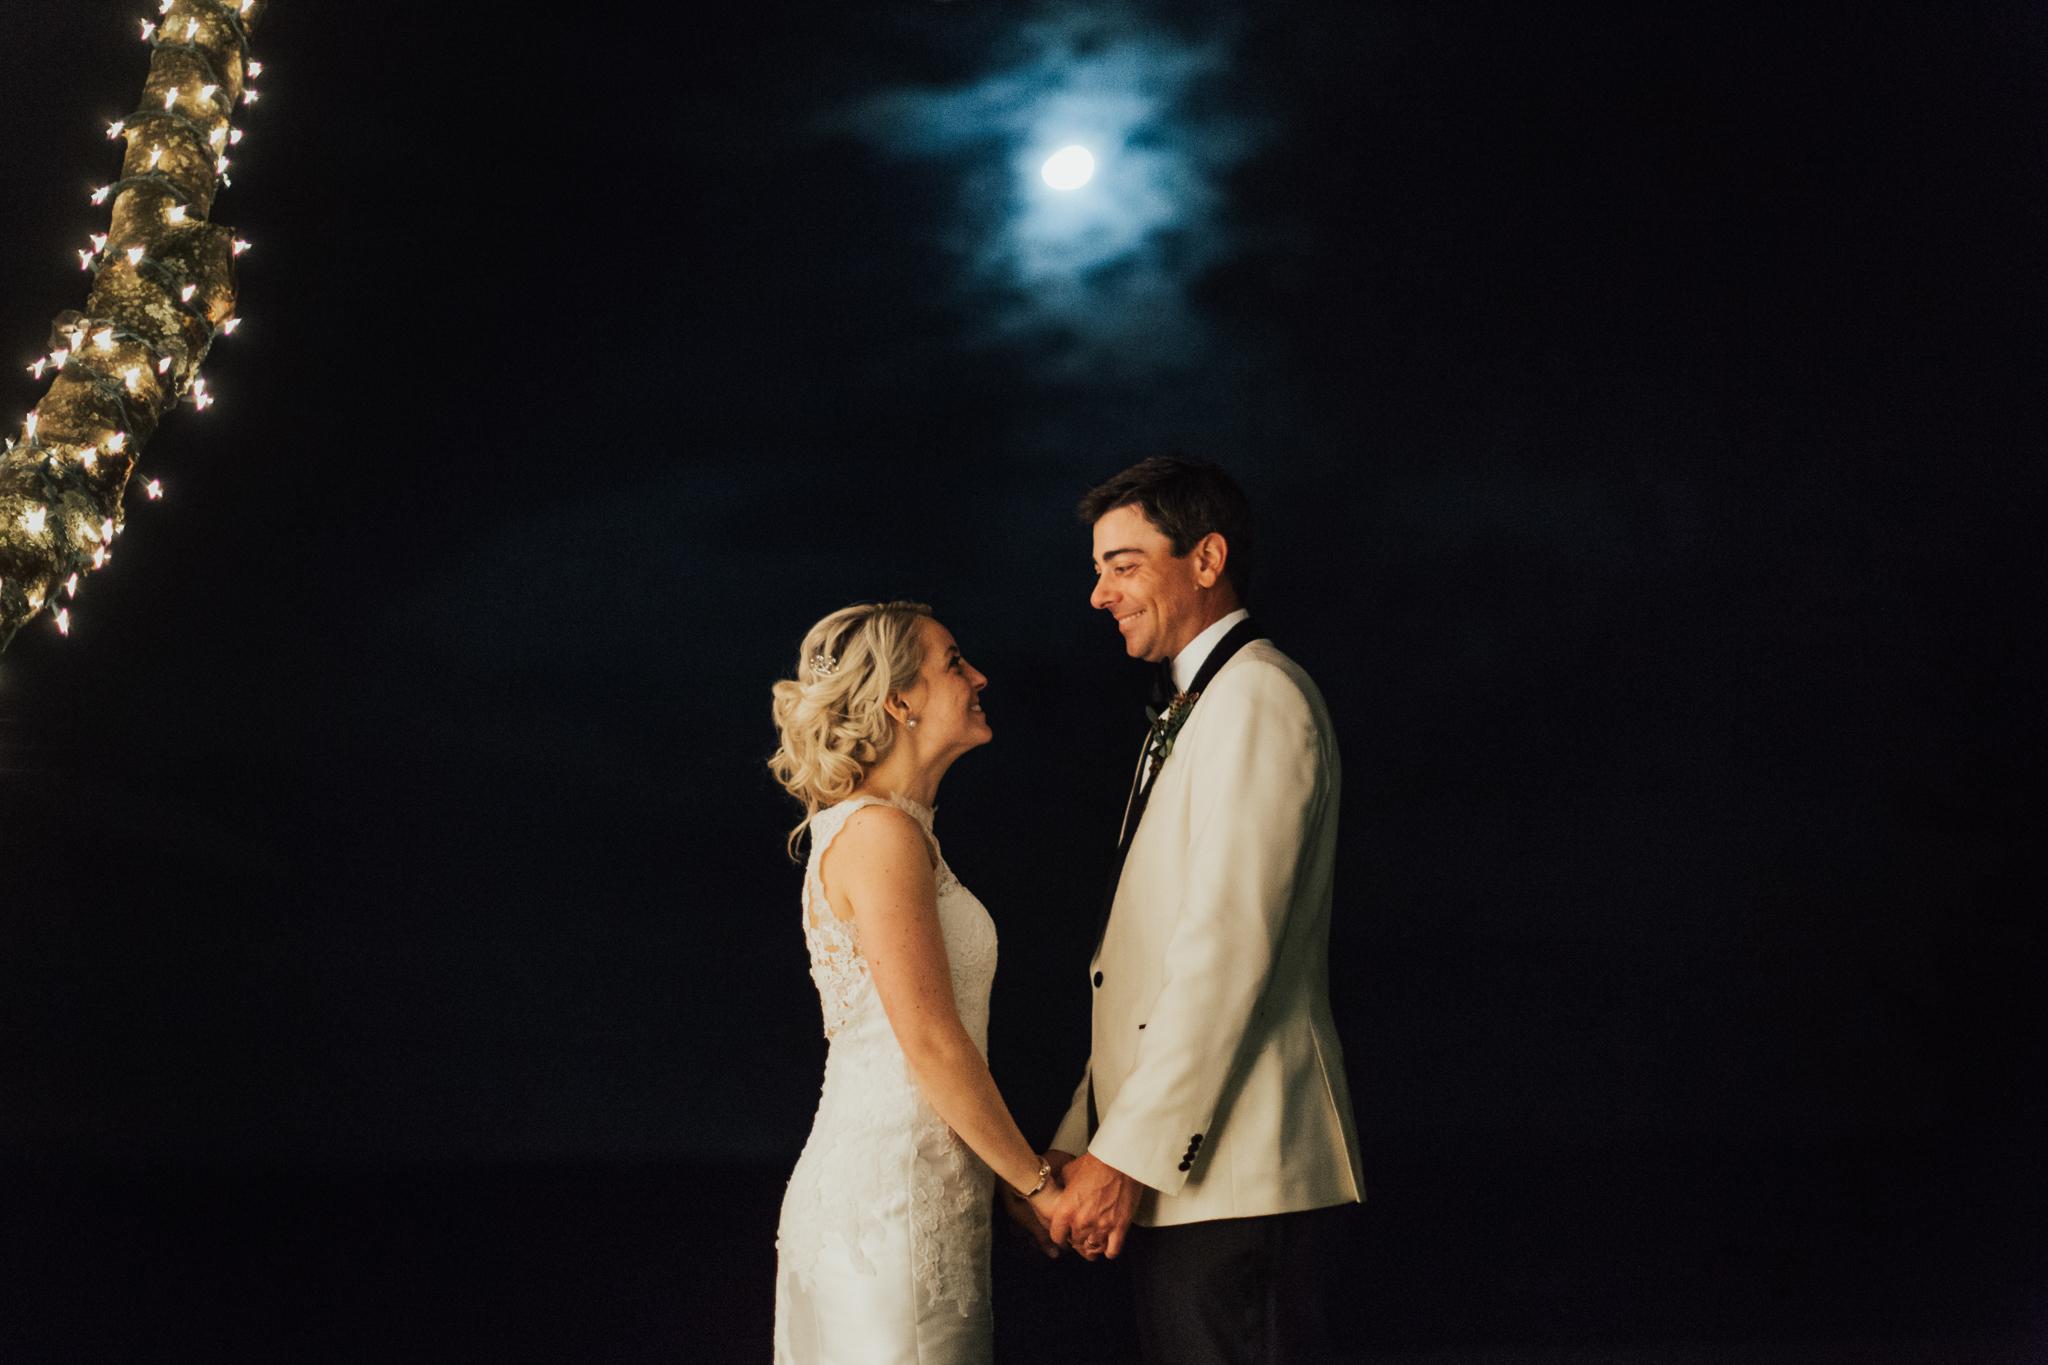 bride and groom under moonlight